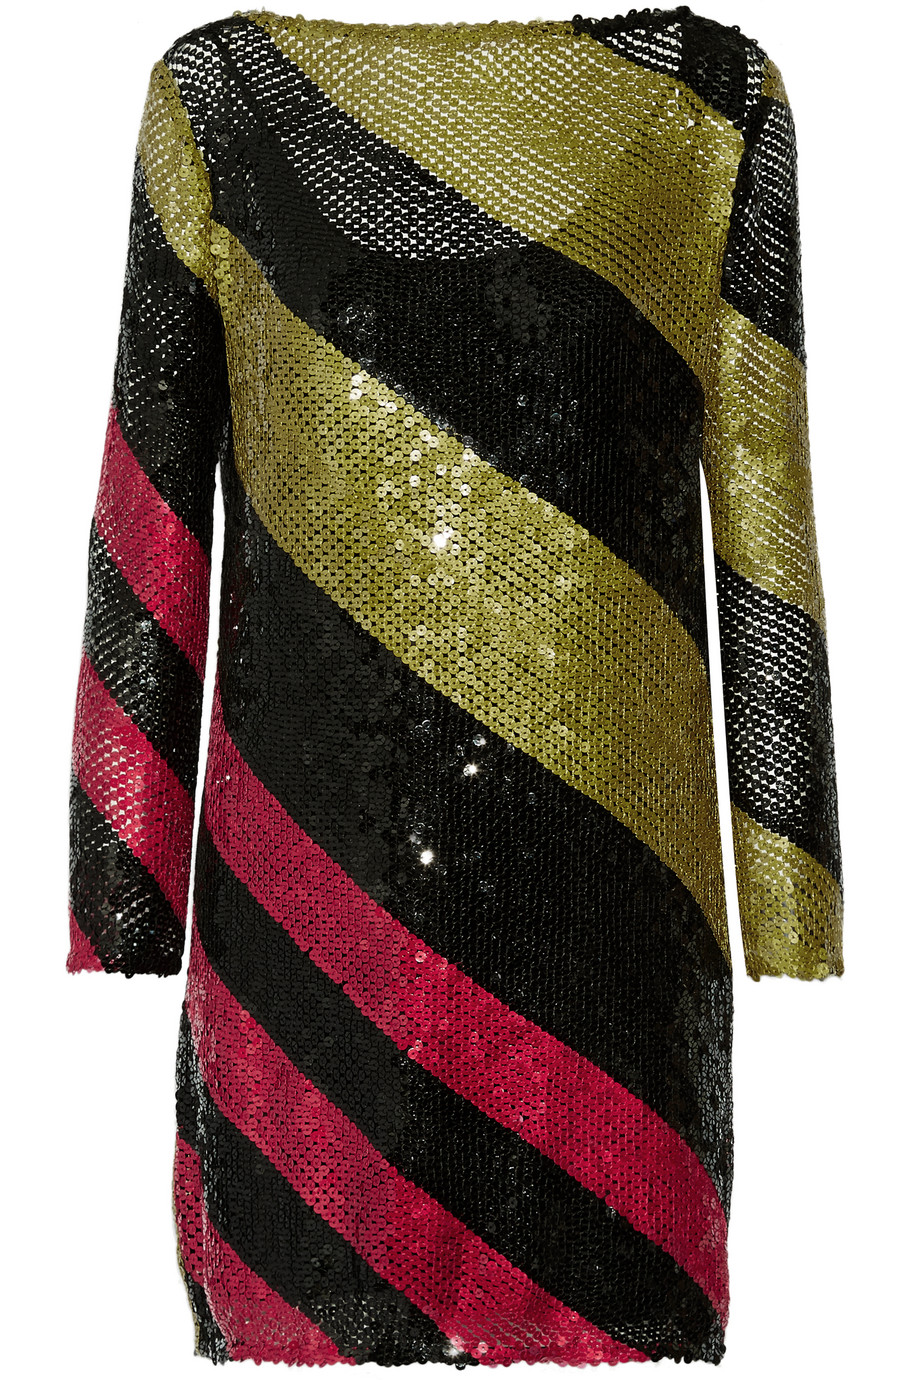 Sonia Rykiel Sequined Striped Knitted Mini Dress, Black/Metallic, Women's - Striped, Size: 40